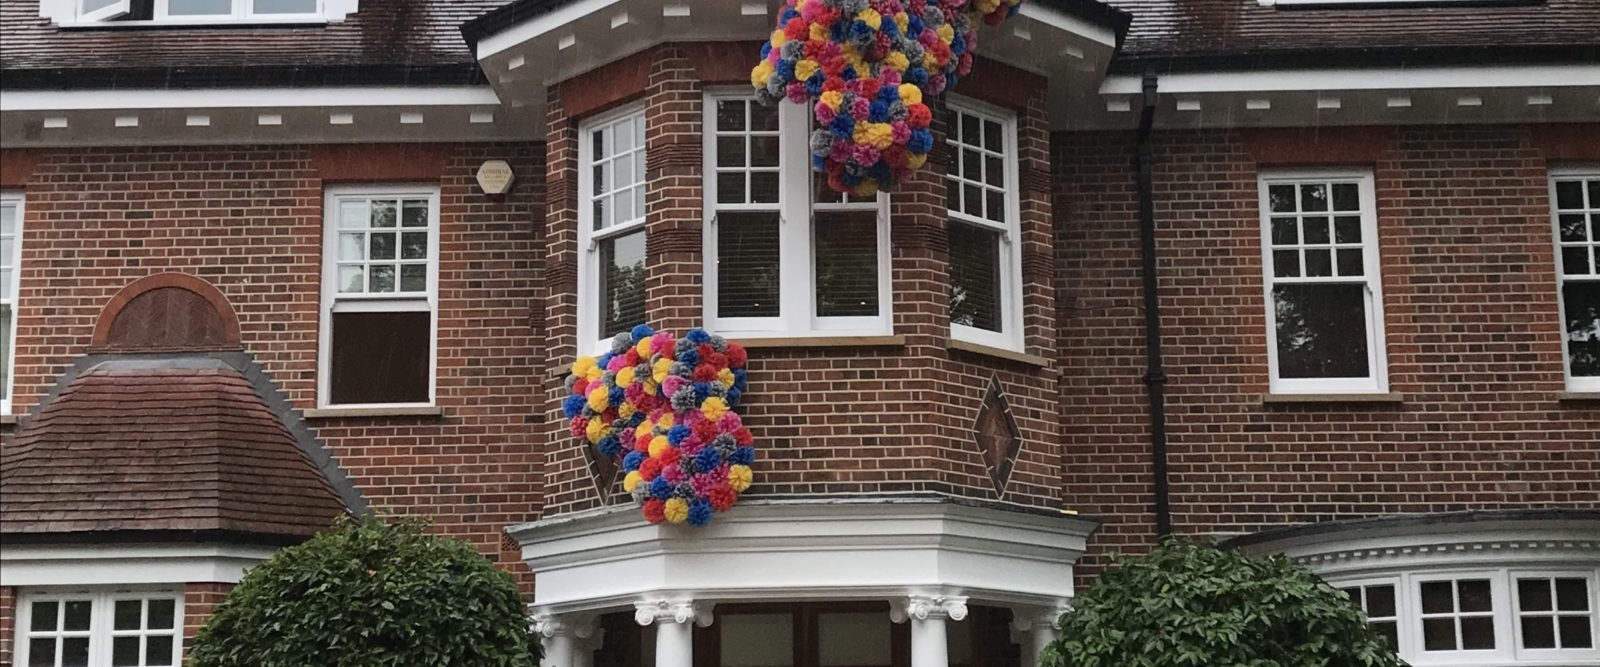 Francesca-Pasquali-Spiderballs-Wimbledon-2017-London